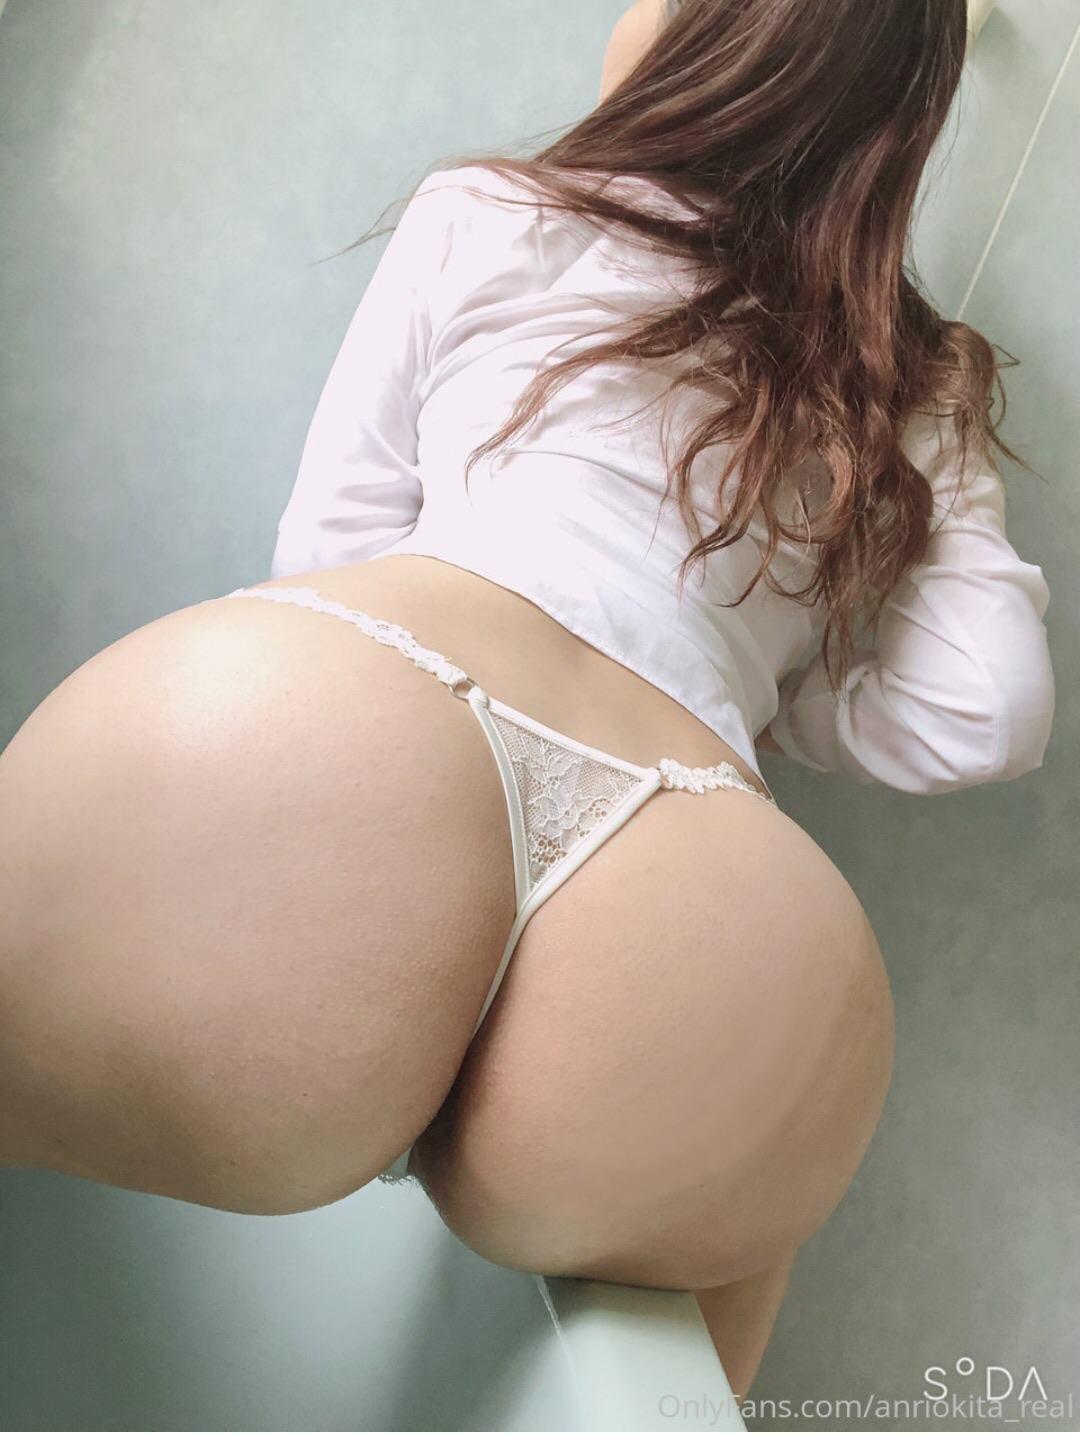 Anri Okita nude